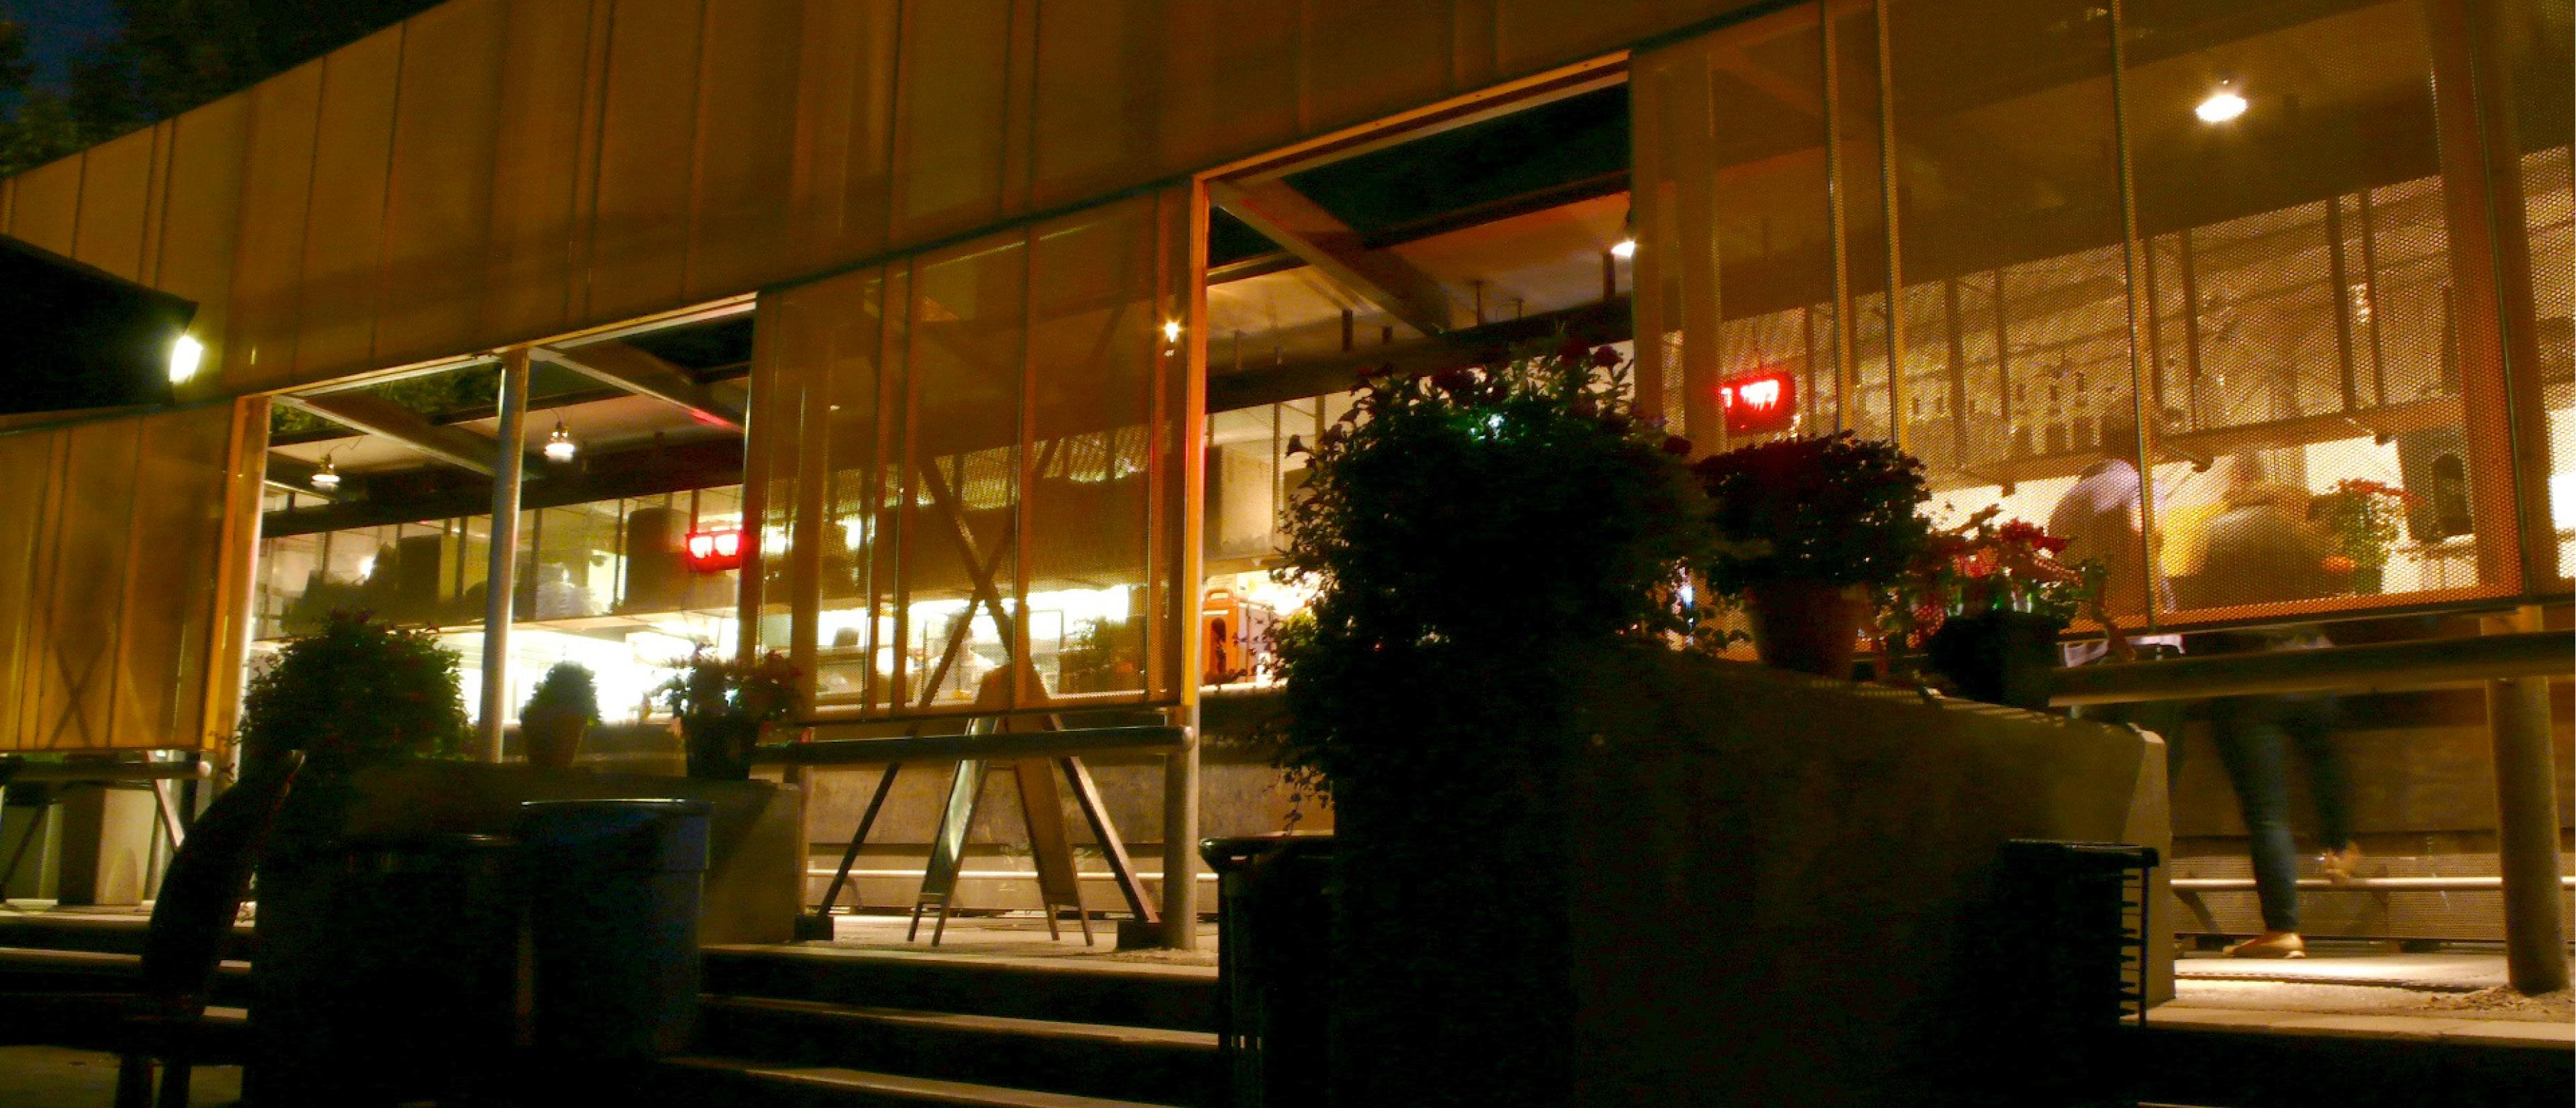 Pier i Cafe 5